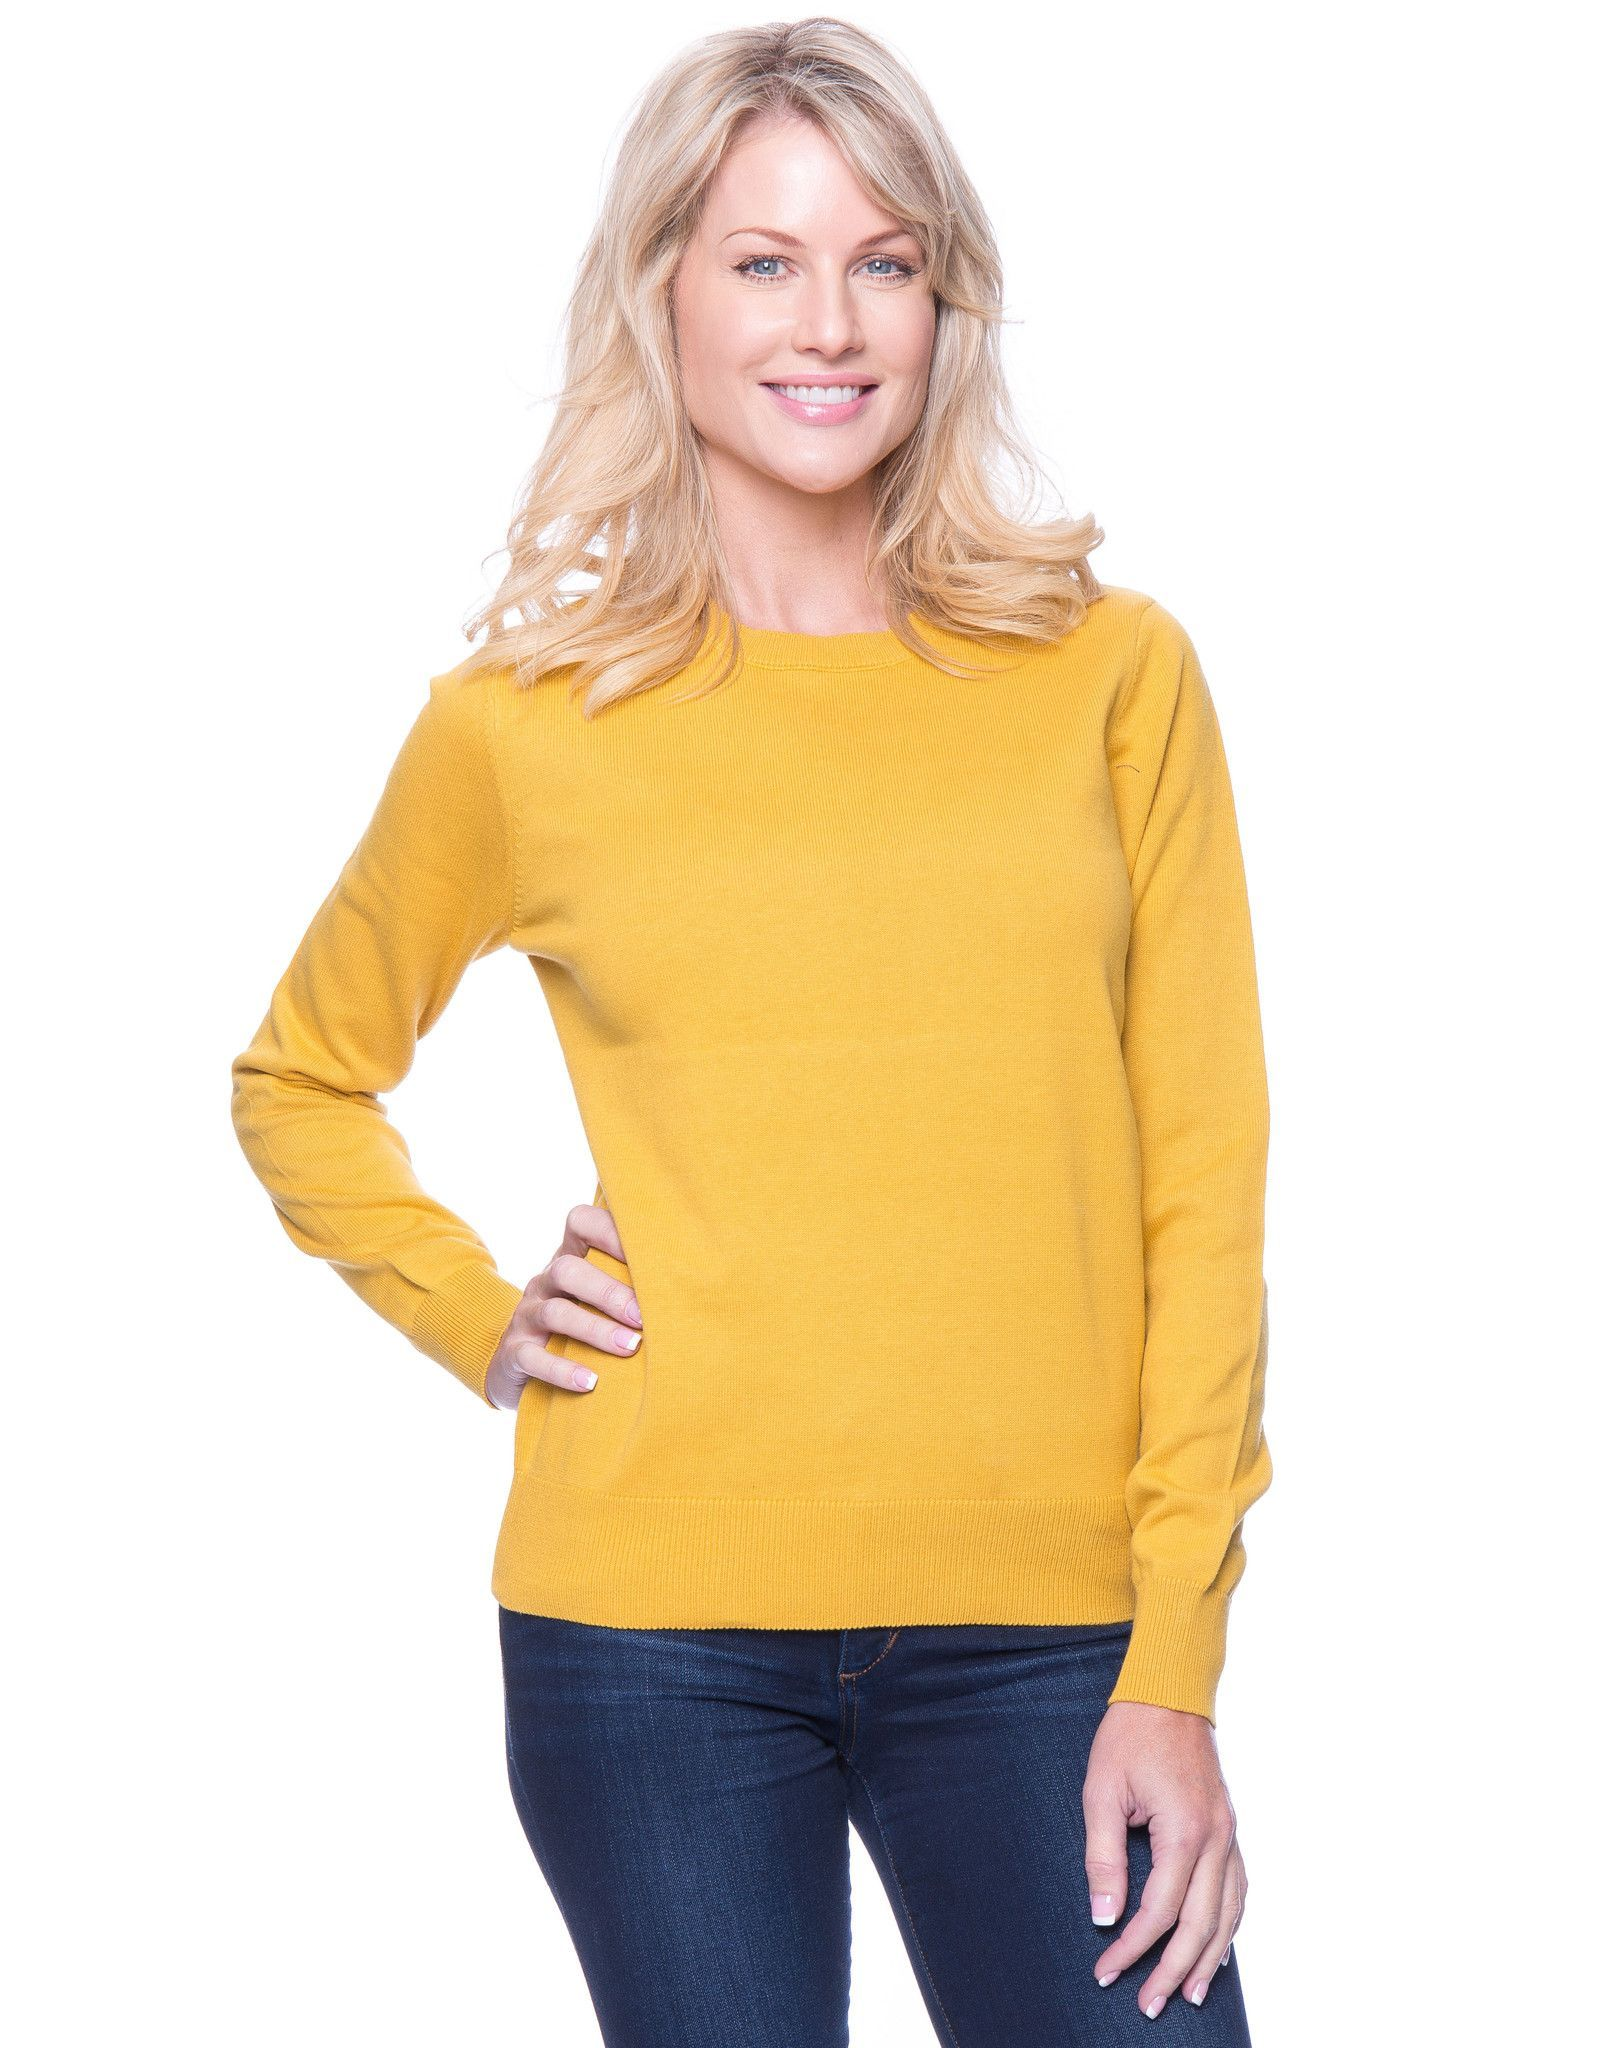 Tocco Reale Women's Premium Cotton Crew Neck Sweater | Crew neck ...